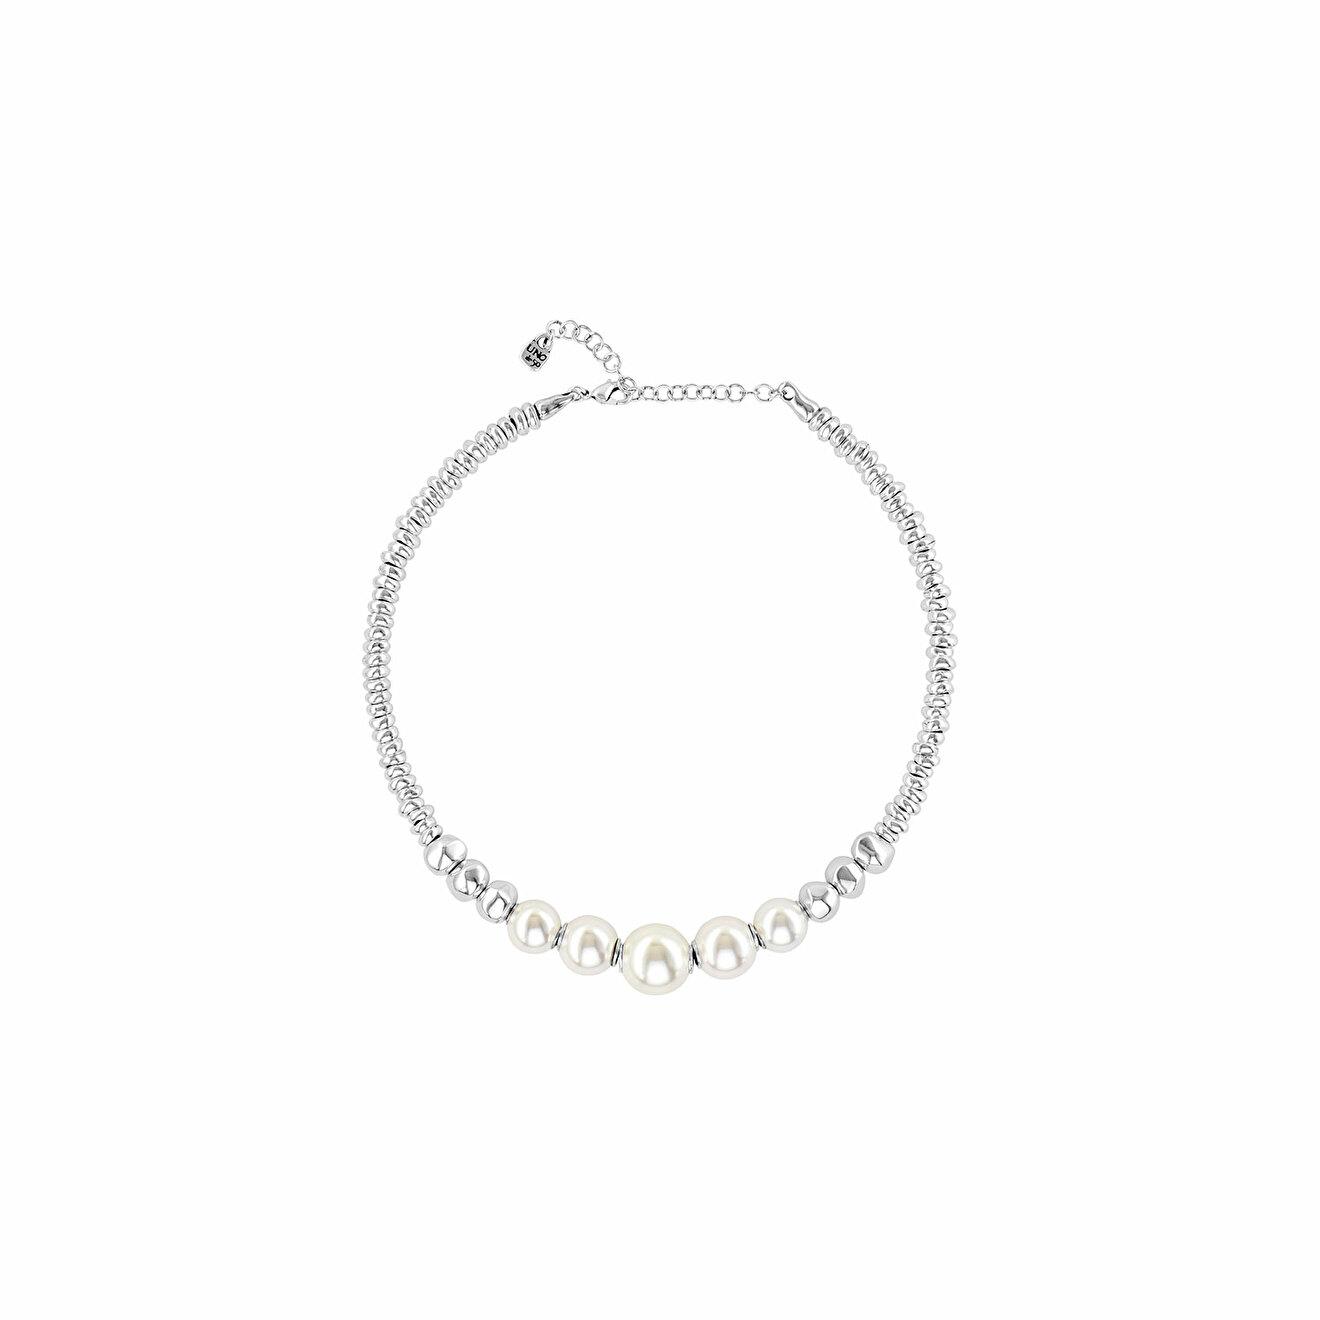 Unode50 Покрытое серебром ожерелье с синтетическими жемчужинами Superlative unode50 покрытое серебром короткое ожерелье с подвесками и синтетическим жемчугом moody